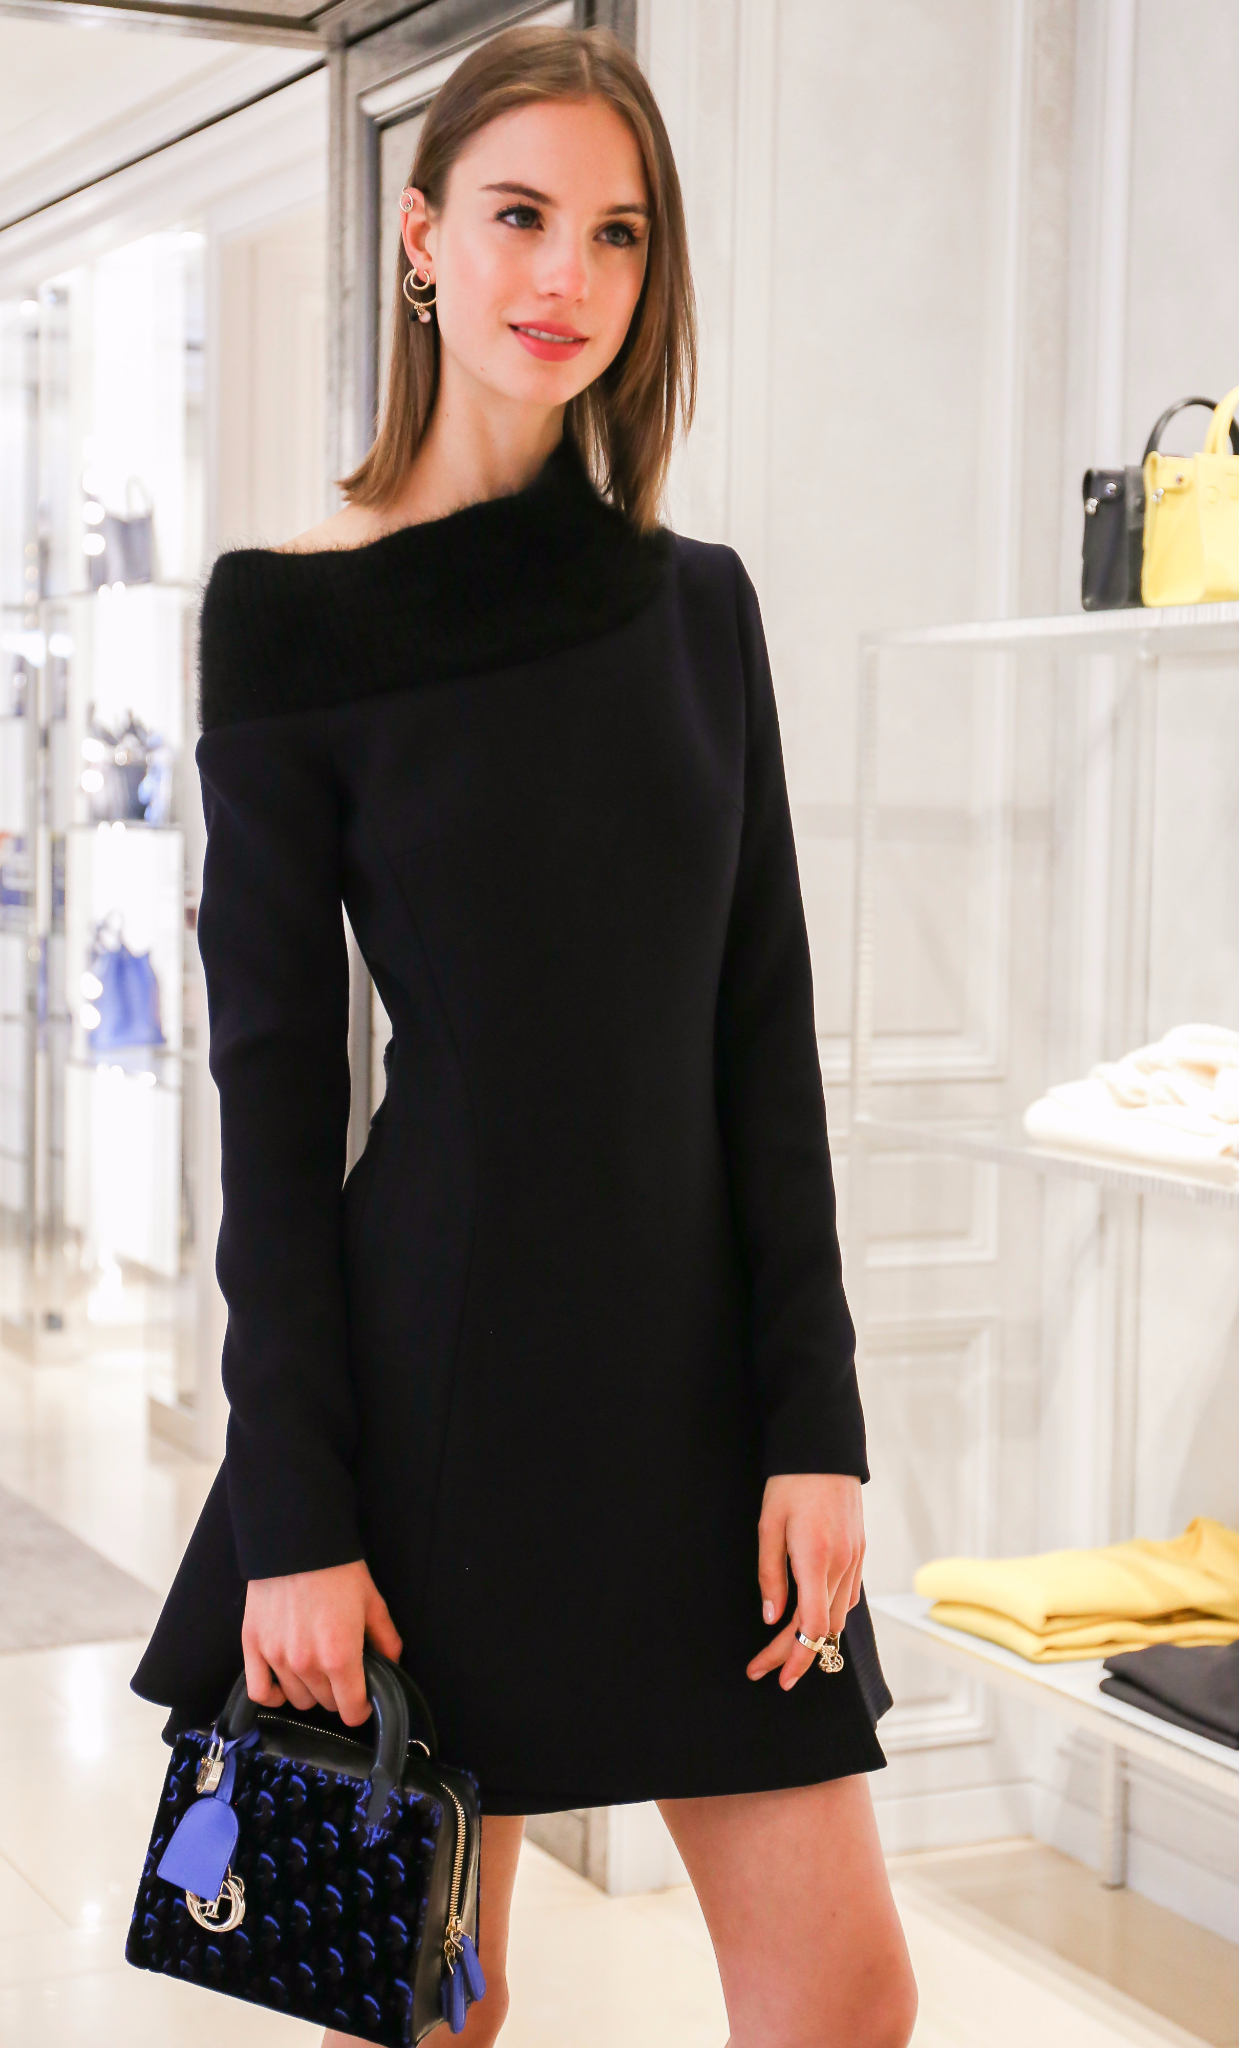 MOD-by-Monique-Fashion-Trends-Dior-Fall-Winter-2016-2017-47-1